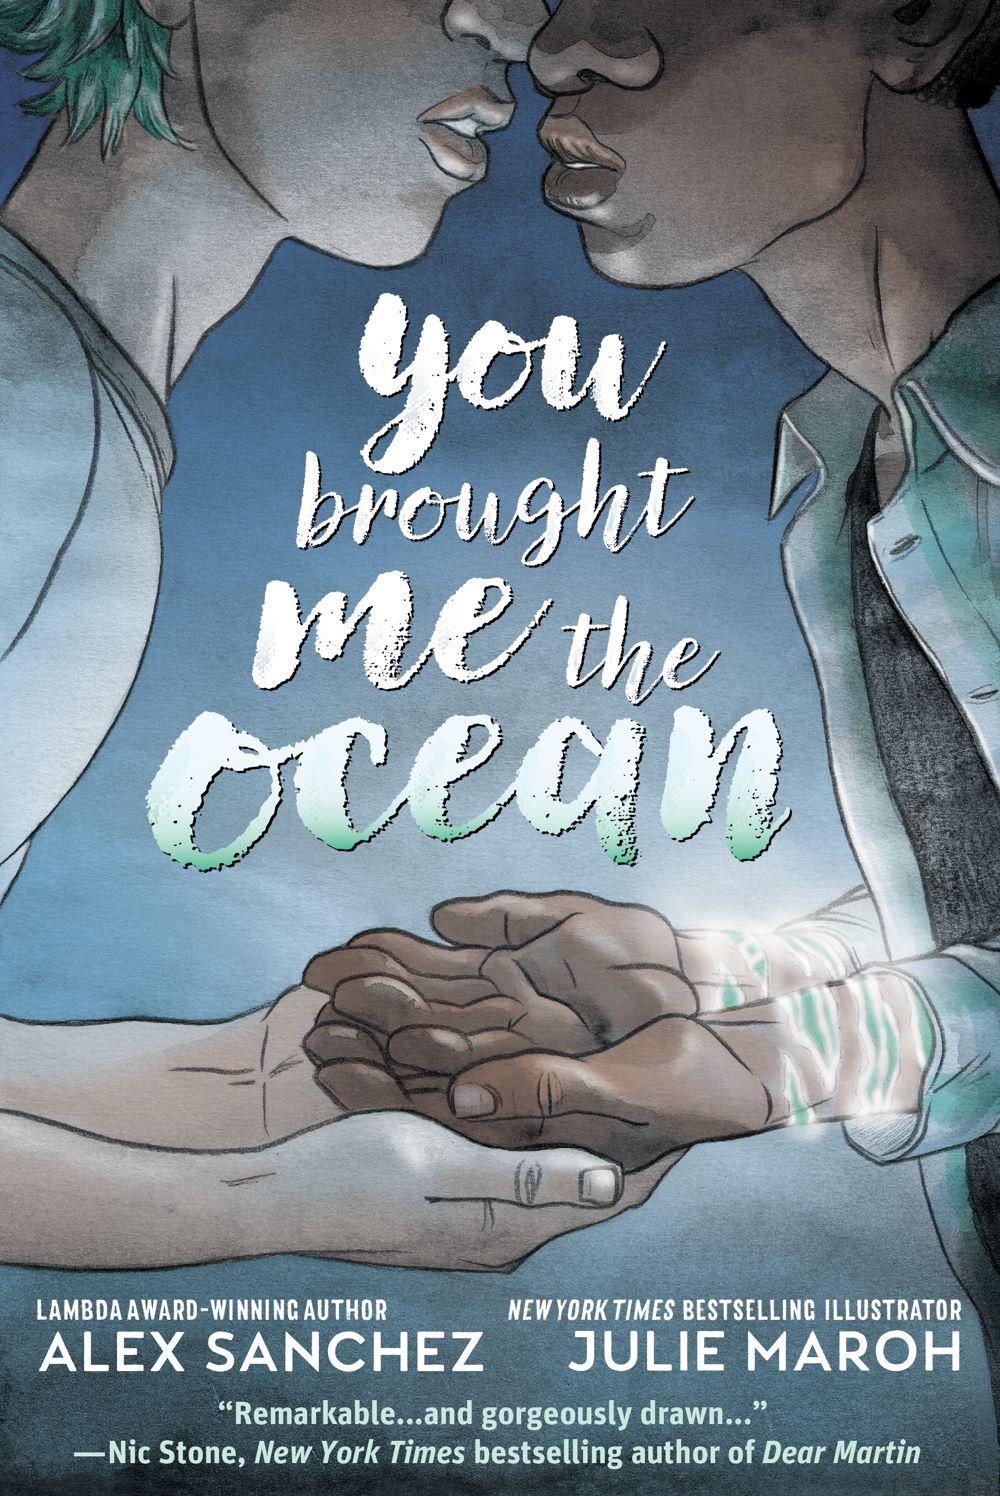 You-Brought-Me-The-Ocean DC Comics June 2021 Solicitations